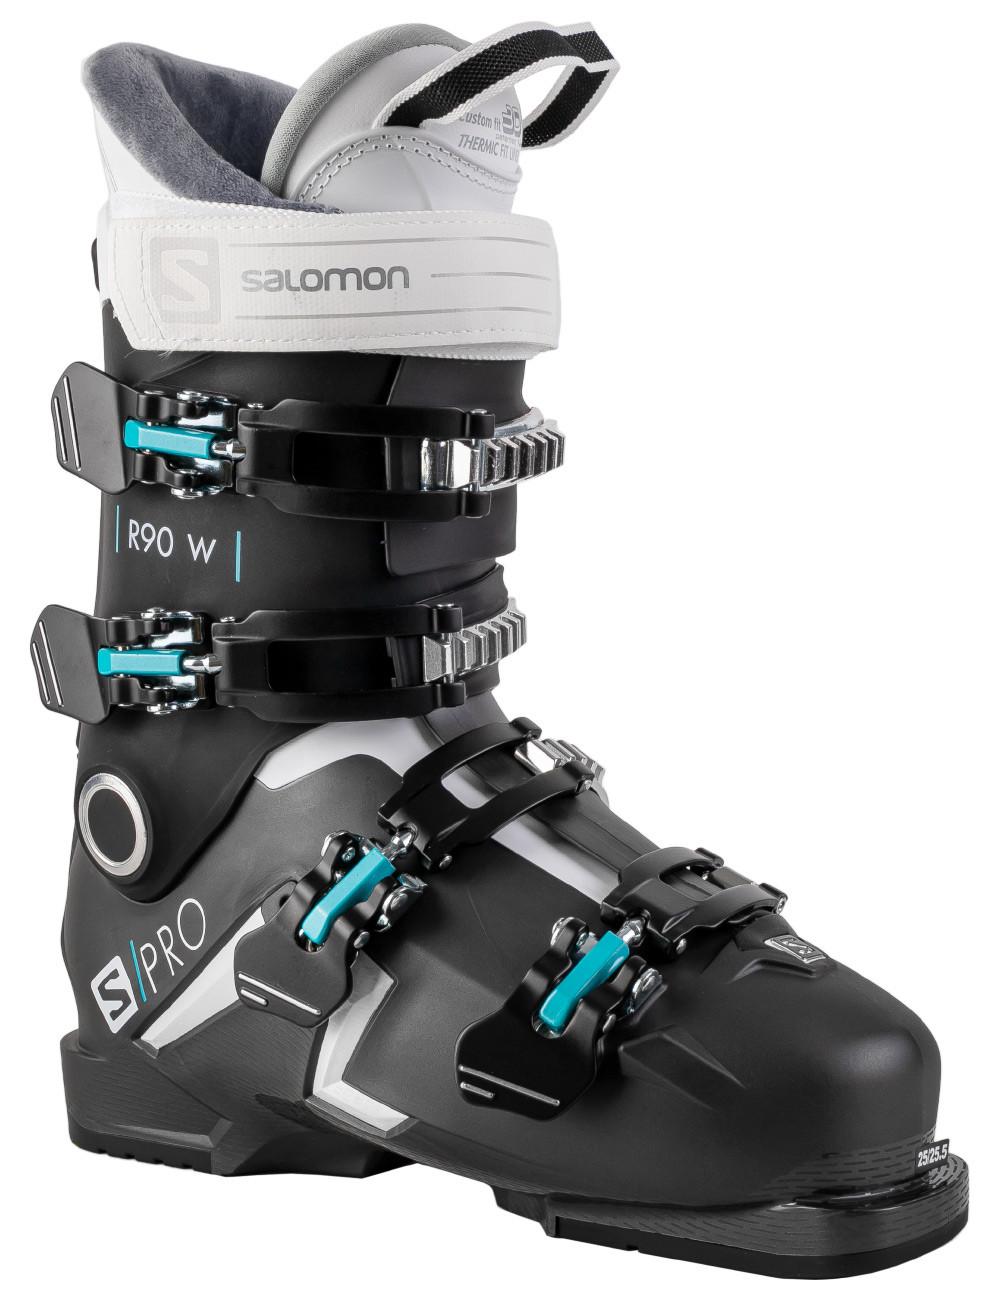 Buty narciarskie damskie Salomon S/PRO R90 BELLUGA